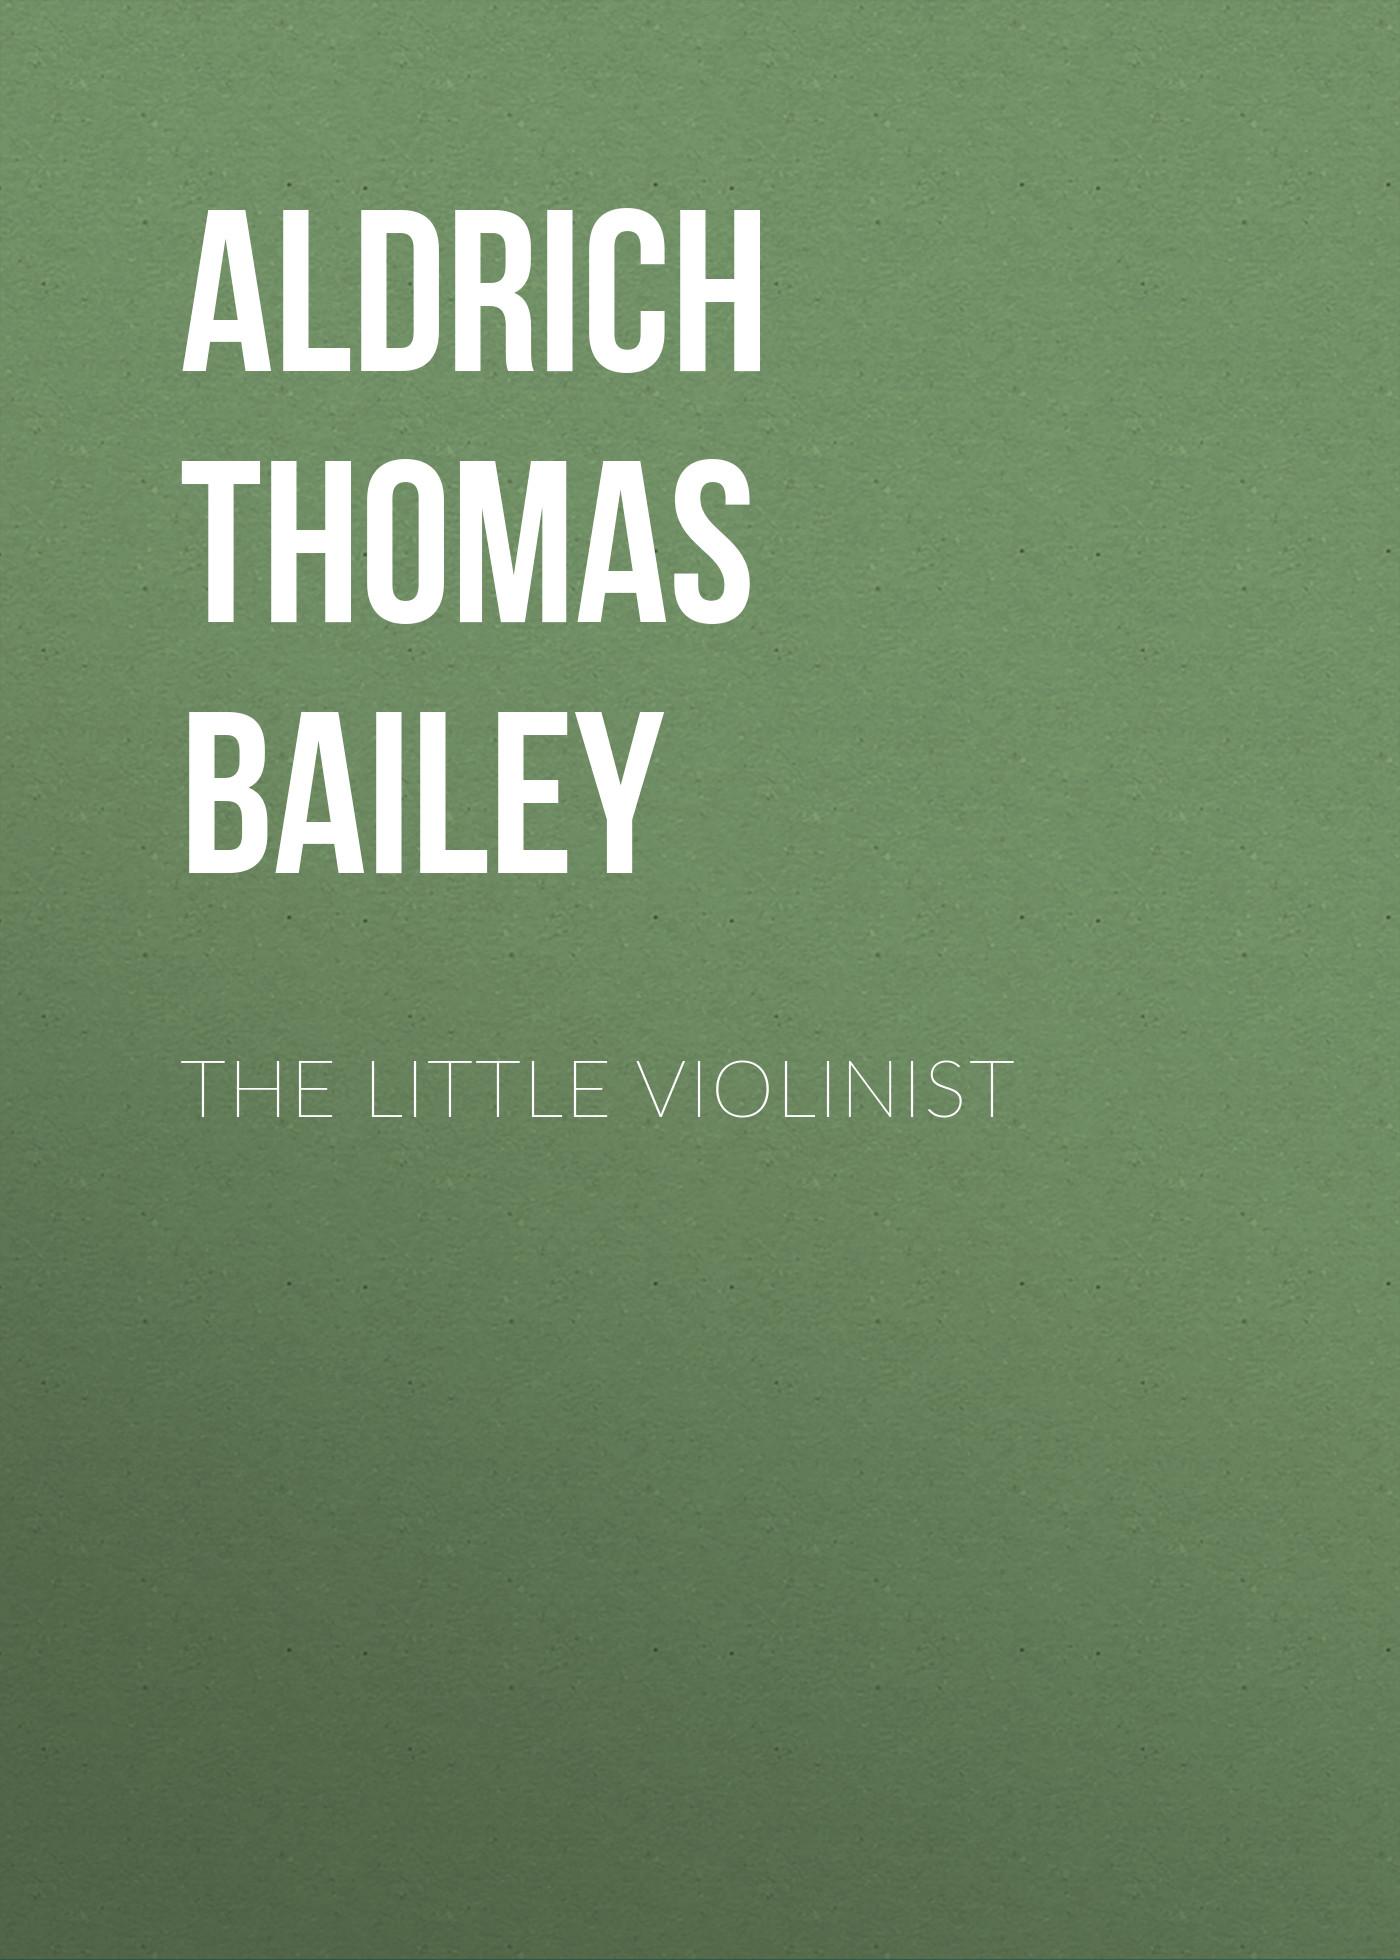 Aldrich Thomas Bailey The Little Violinist aldrich thomas bailey wyndham towers